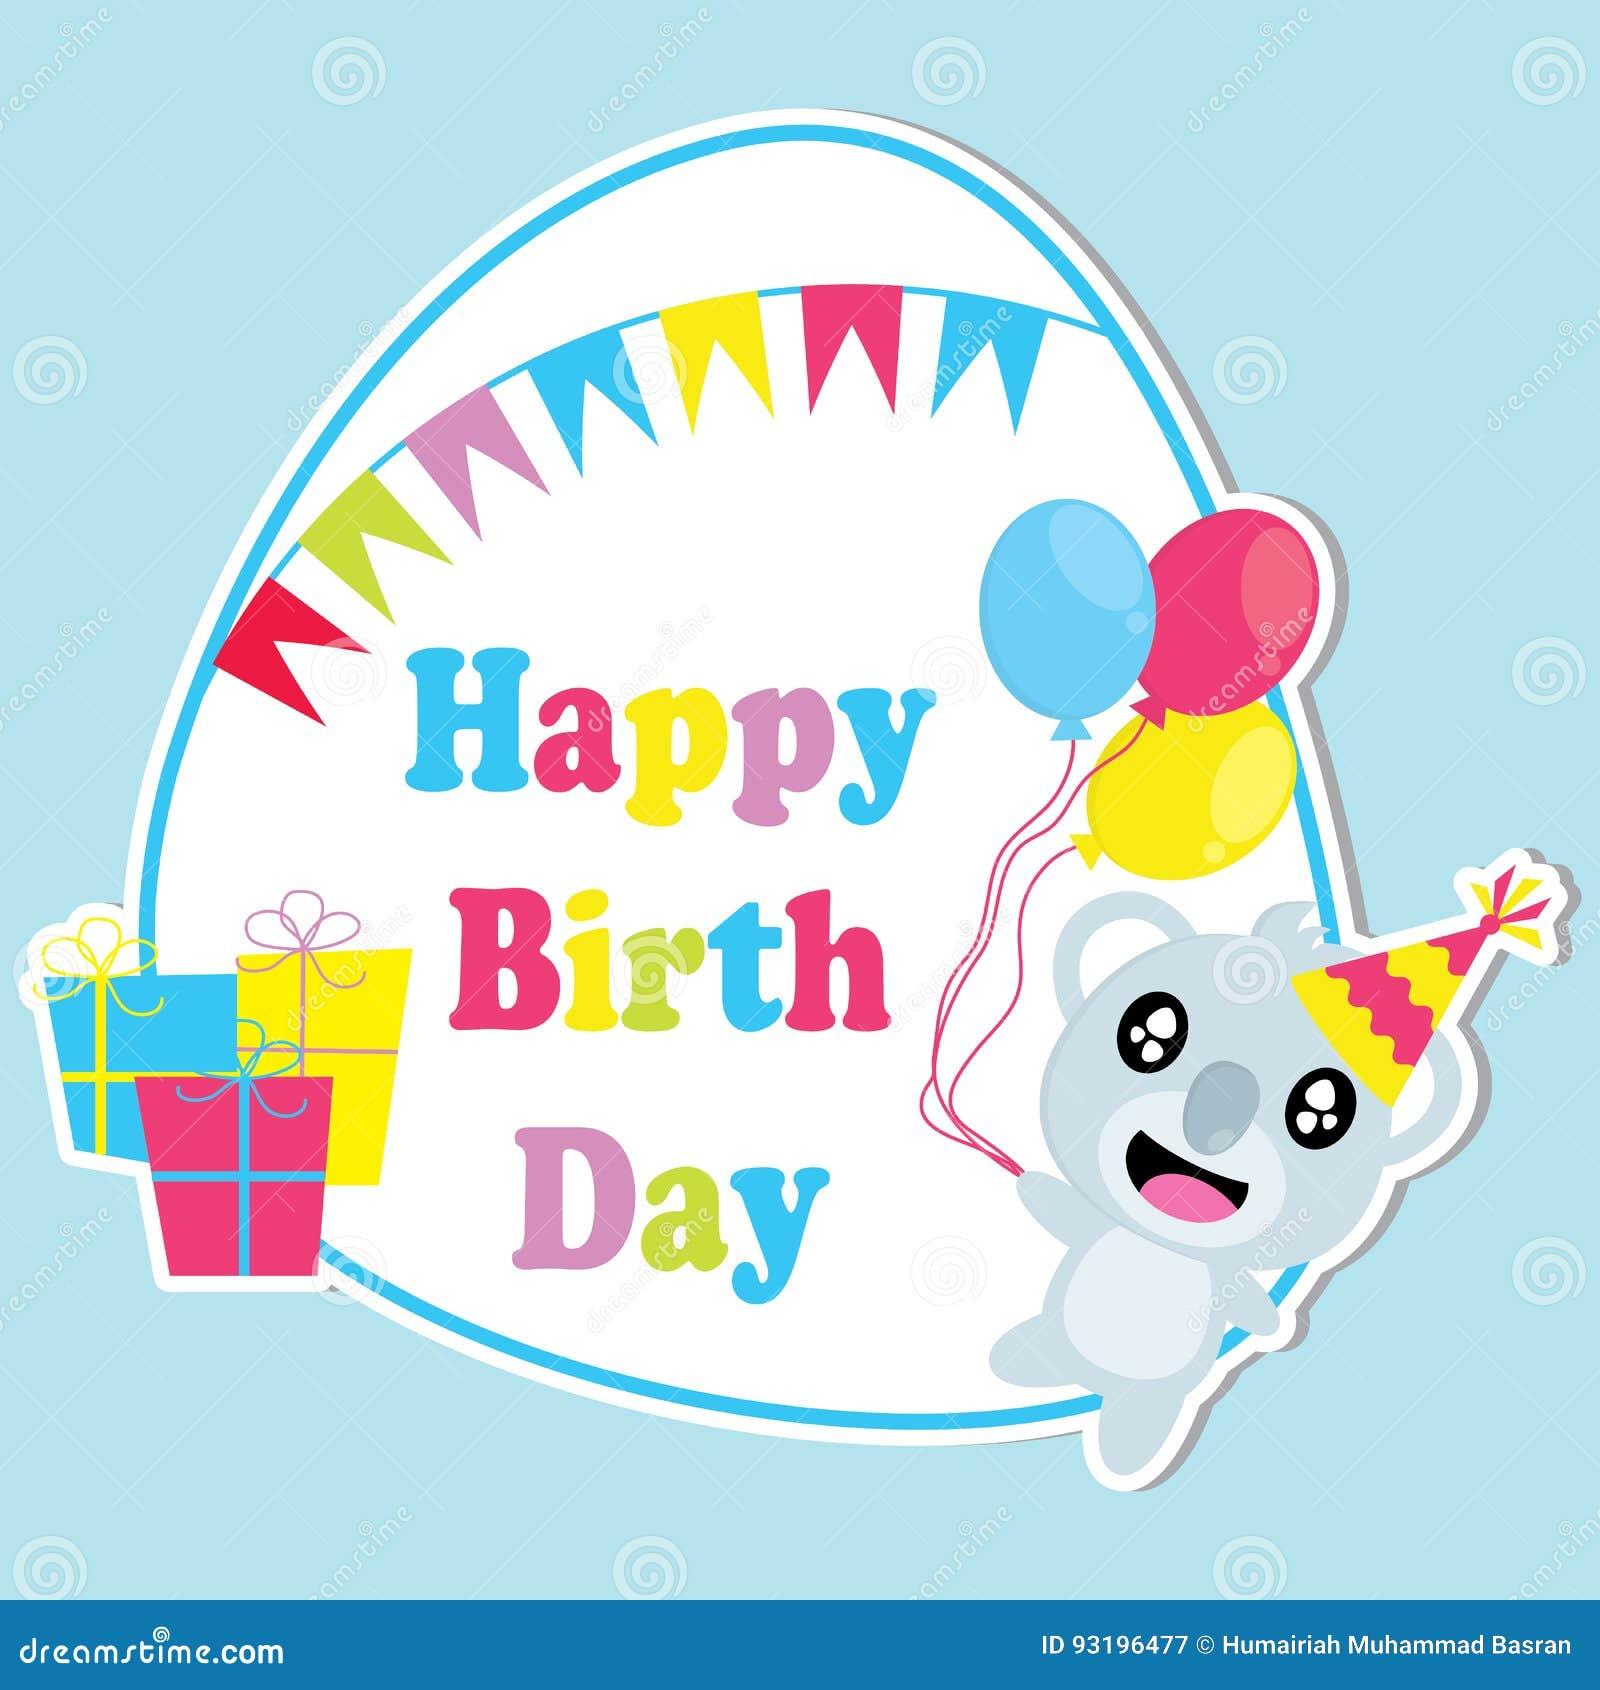 Download Wallpaper Koala Cartoon - cute-koala-brings-balloons-colorful-flag-frame-cartoon-birthday-postcard-wallpaper-greeting-card-t-shirt-design-kids-93196477  Picture_431142   .jpg